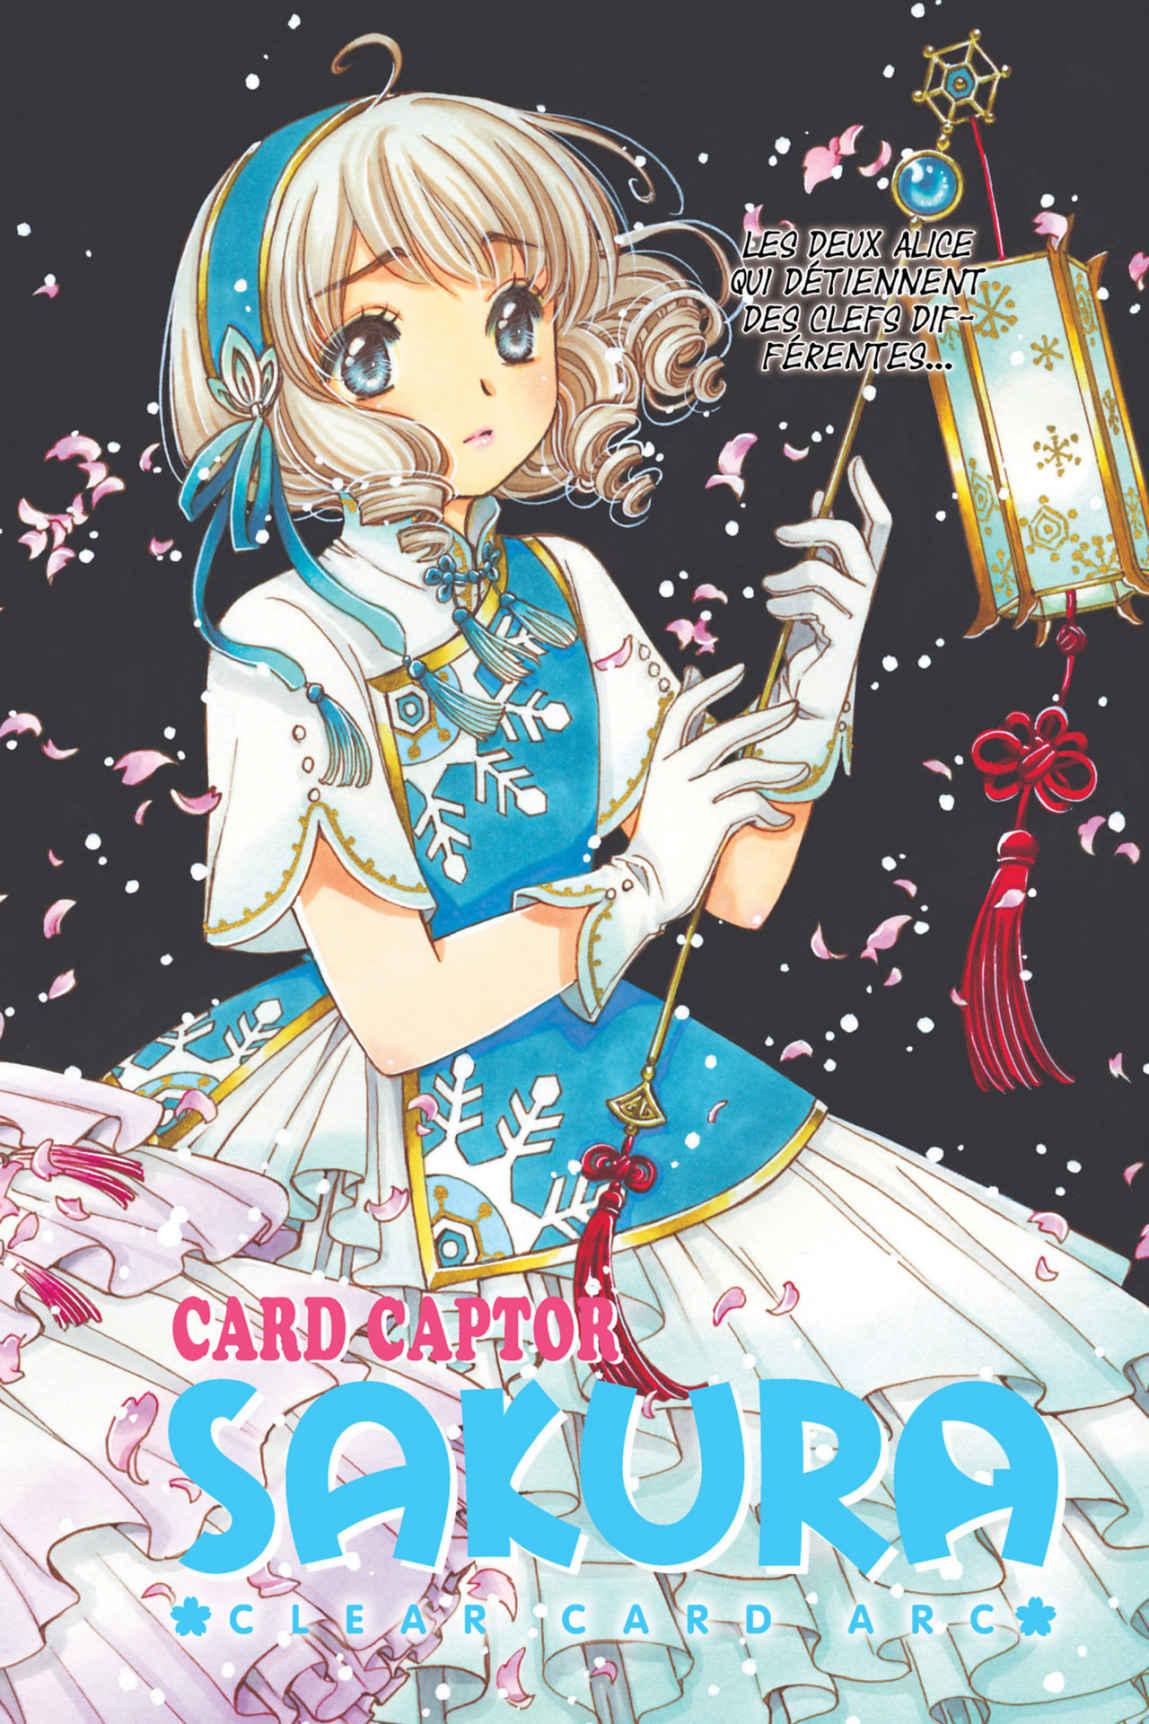 Card Captor Sakura et autres mangas [CLAMP] - Page 39 Cardca13